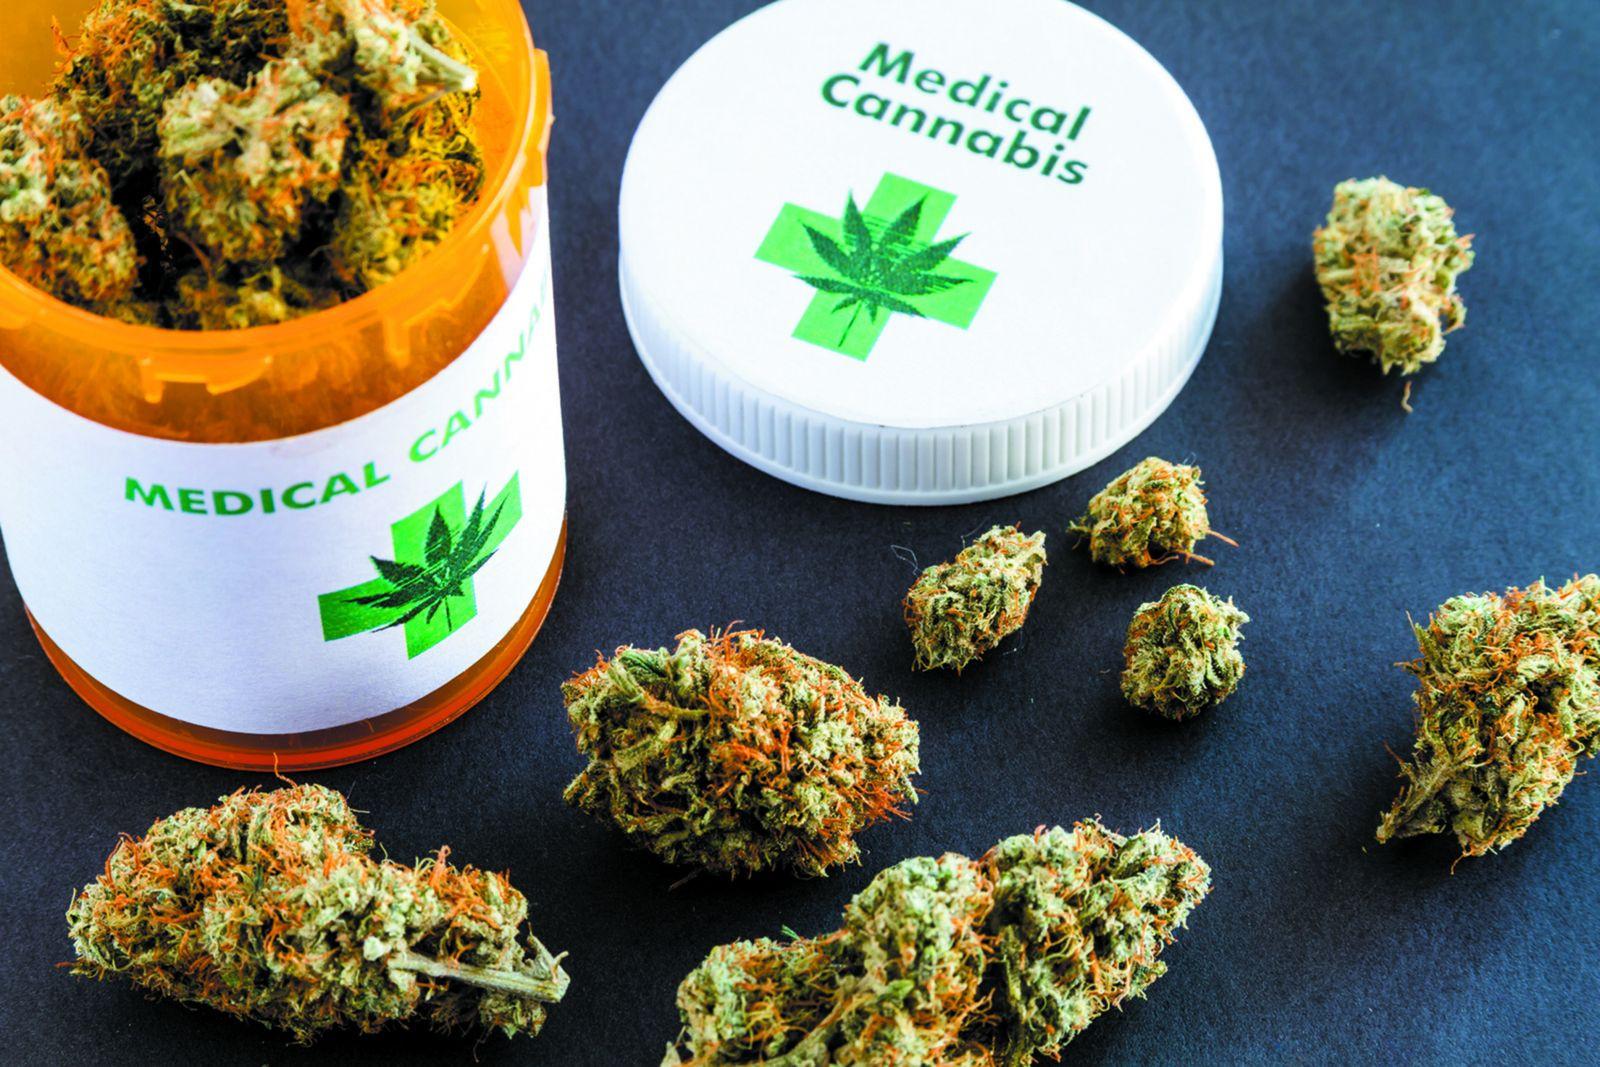 Medical marijuana: Know the facts - Harvard Health